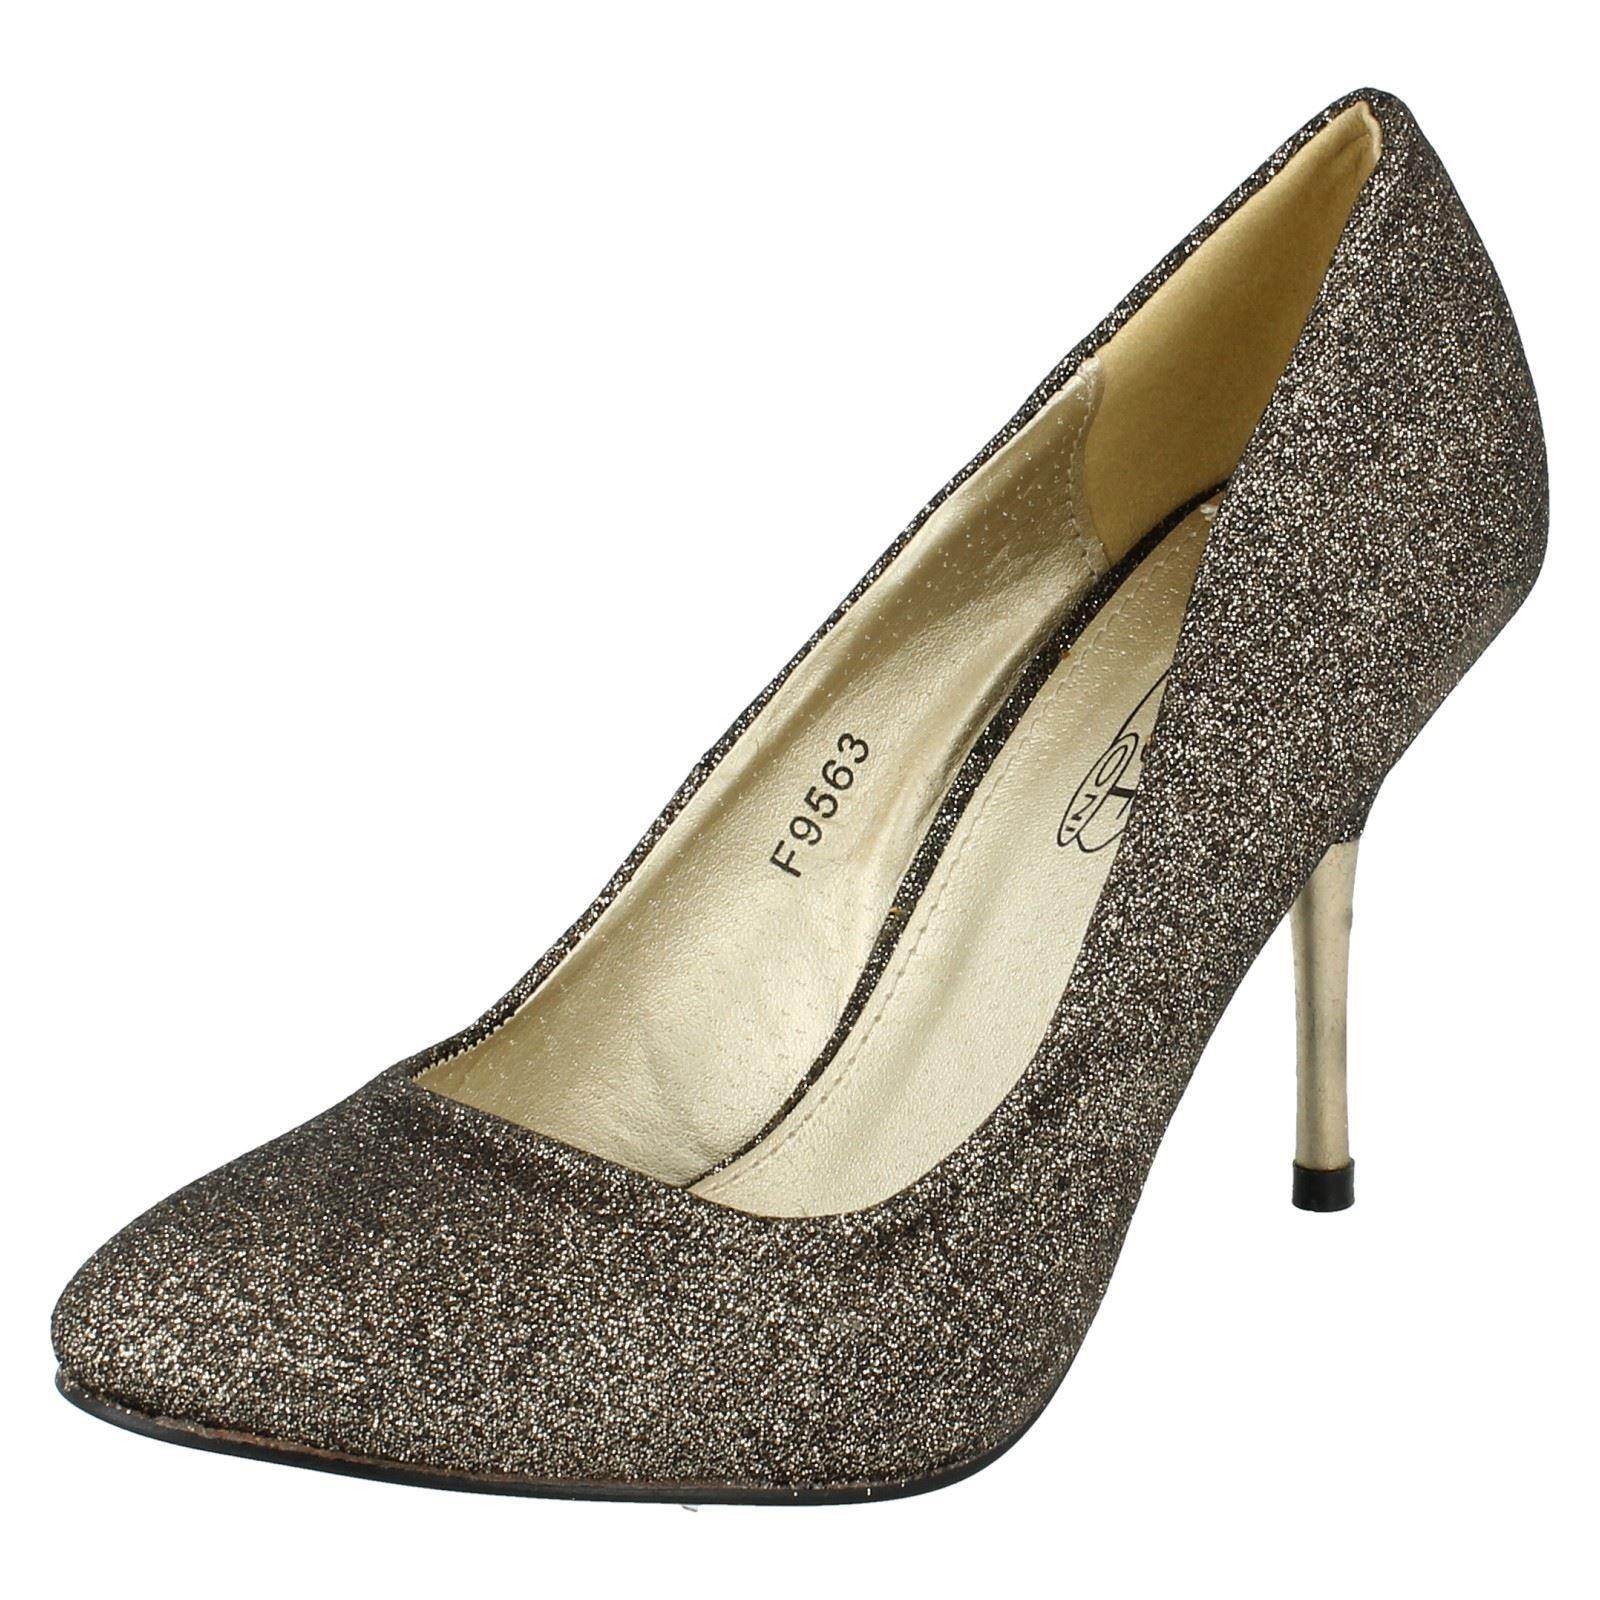 Moda jest prosta i niedroga LADIES SPOT ON BLACK/GOLD GLITTER COURT SHOE STYLE - F9563